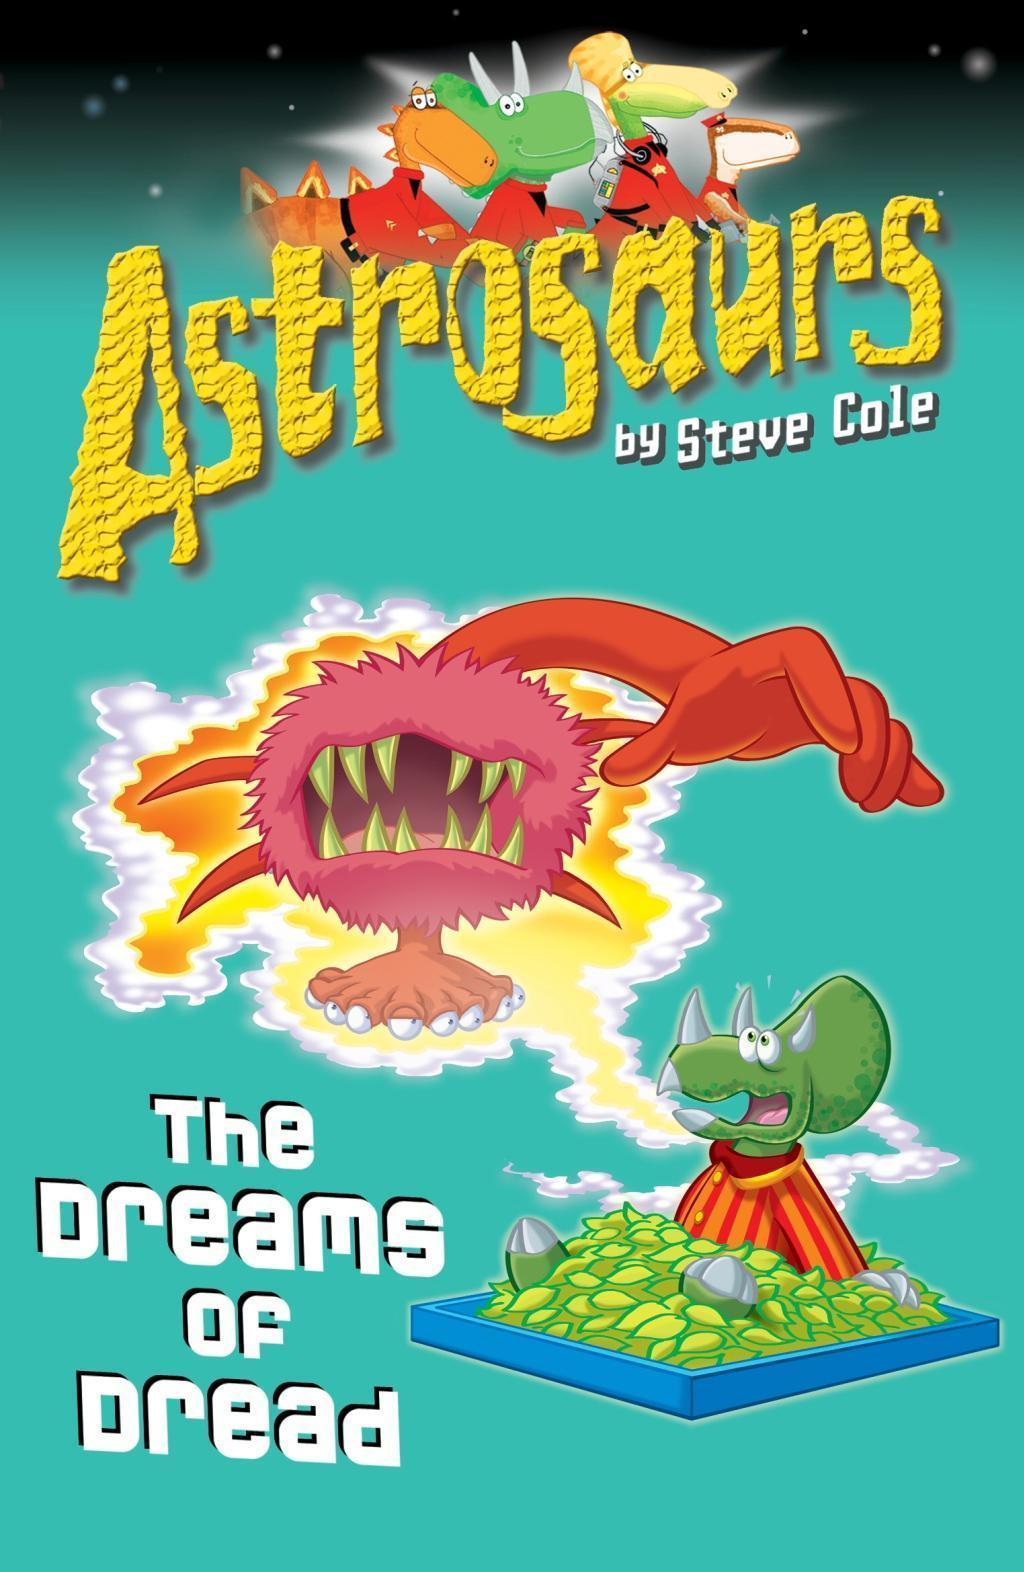 Astrosaurs 15: The Dreams of Dread